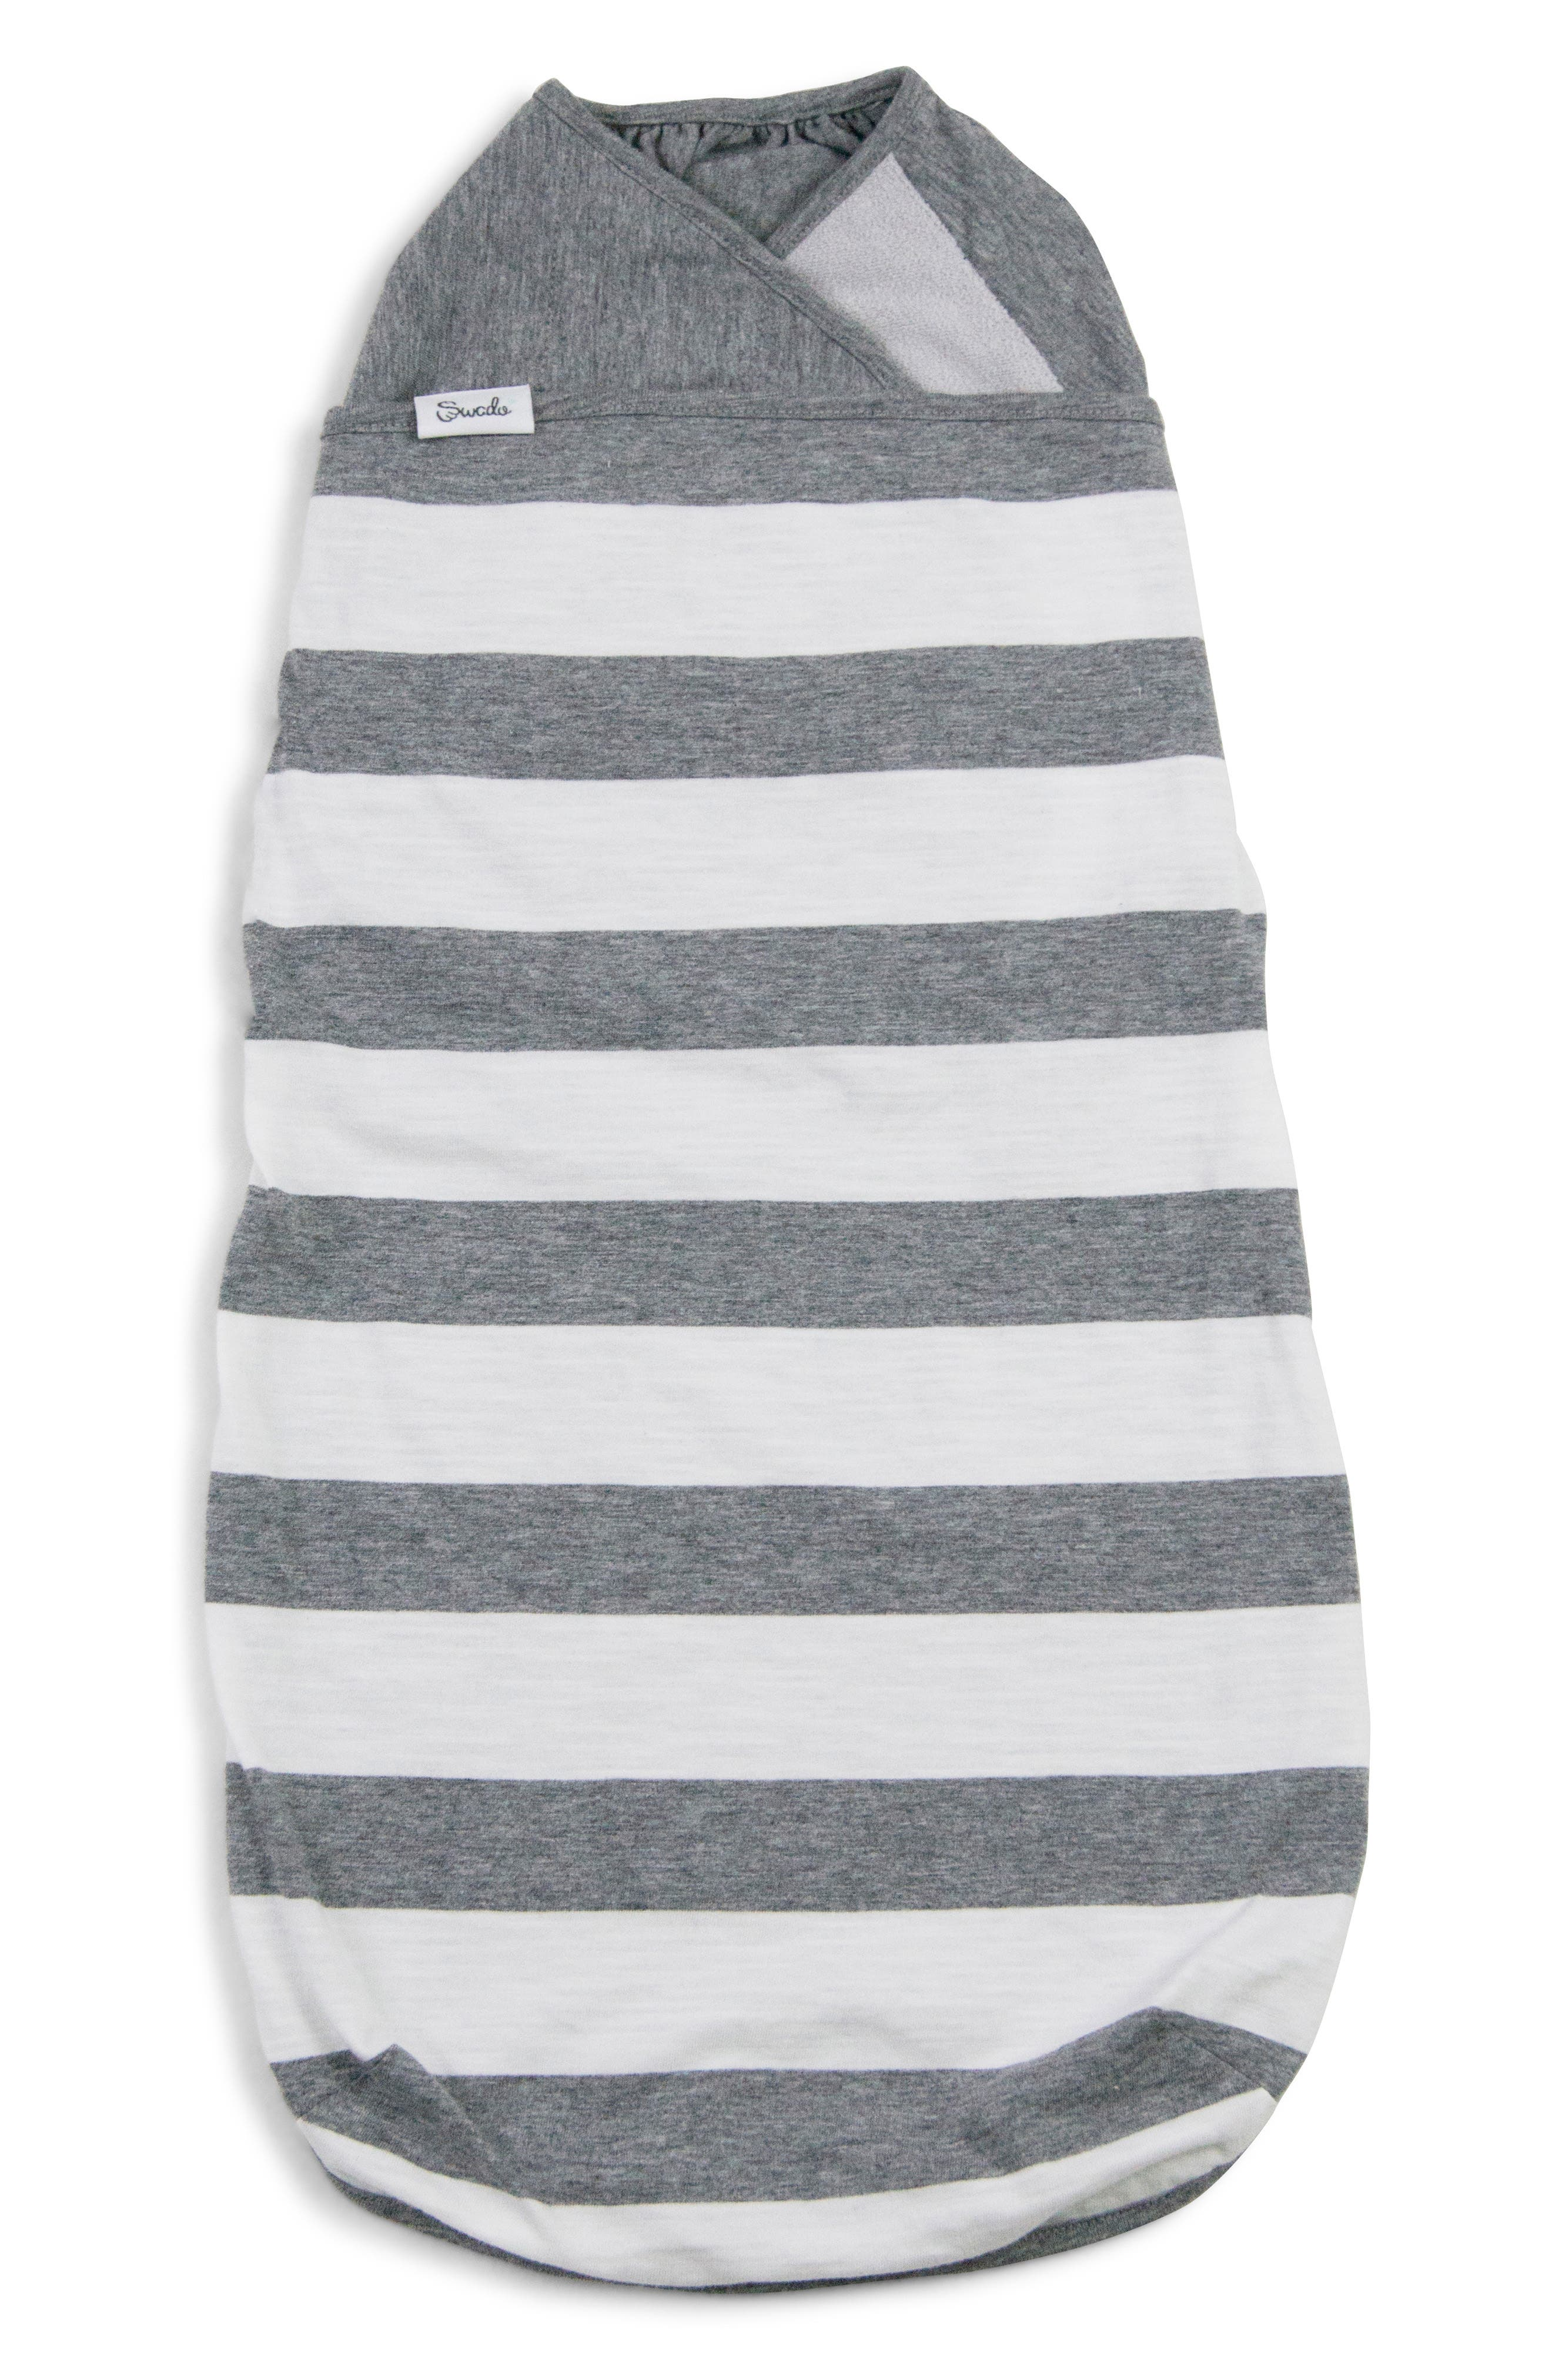 Stripe Wearable Swaddle, Main, color, GREY/ WHITE STRIPE